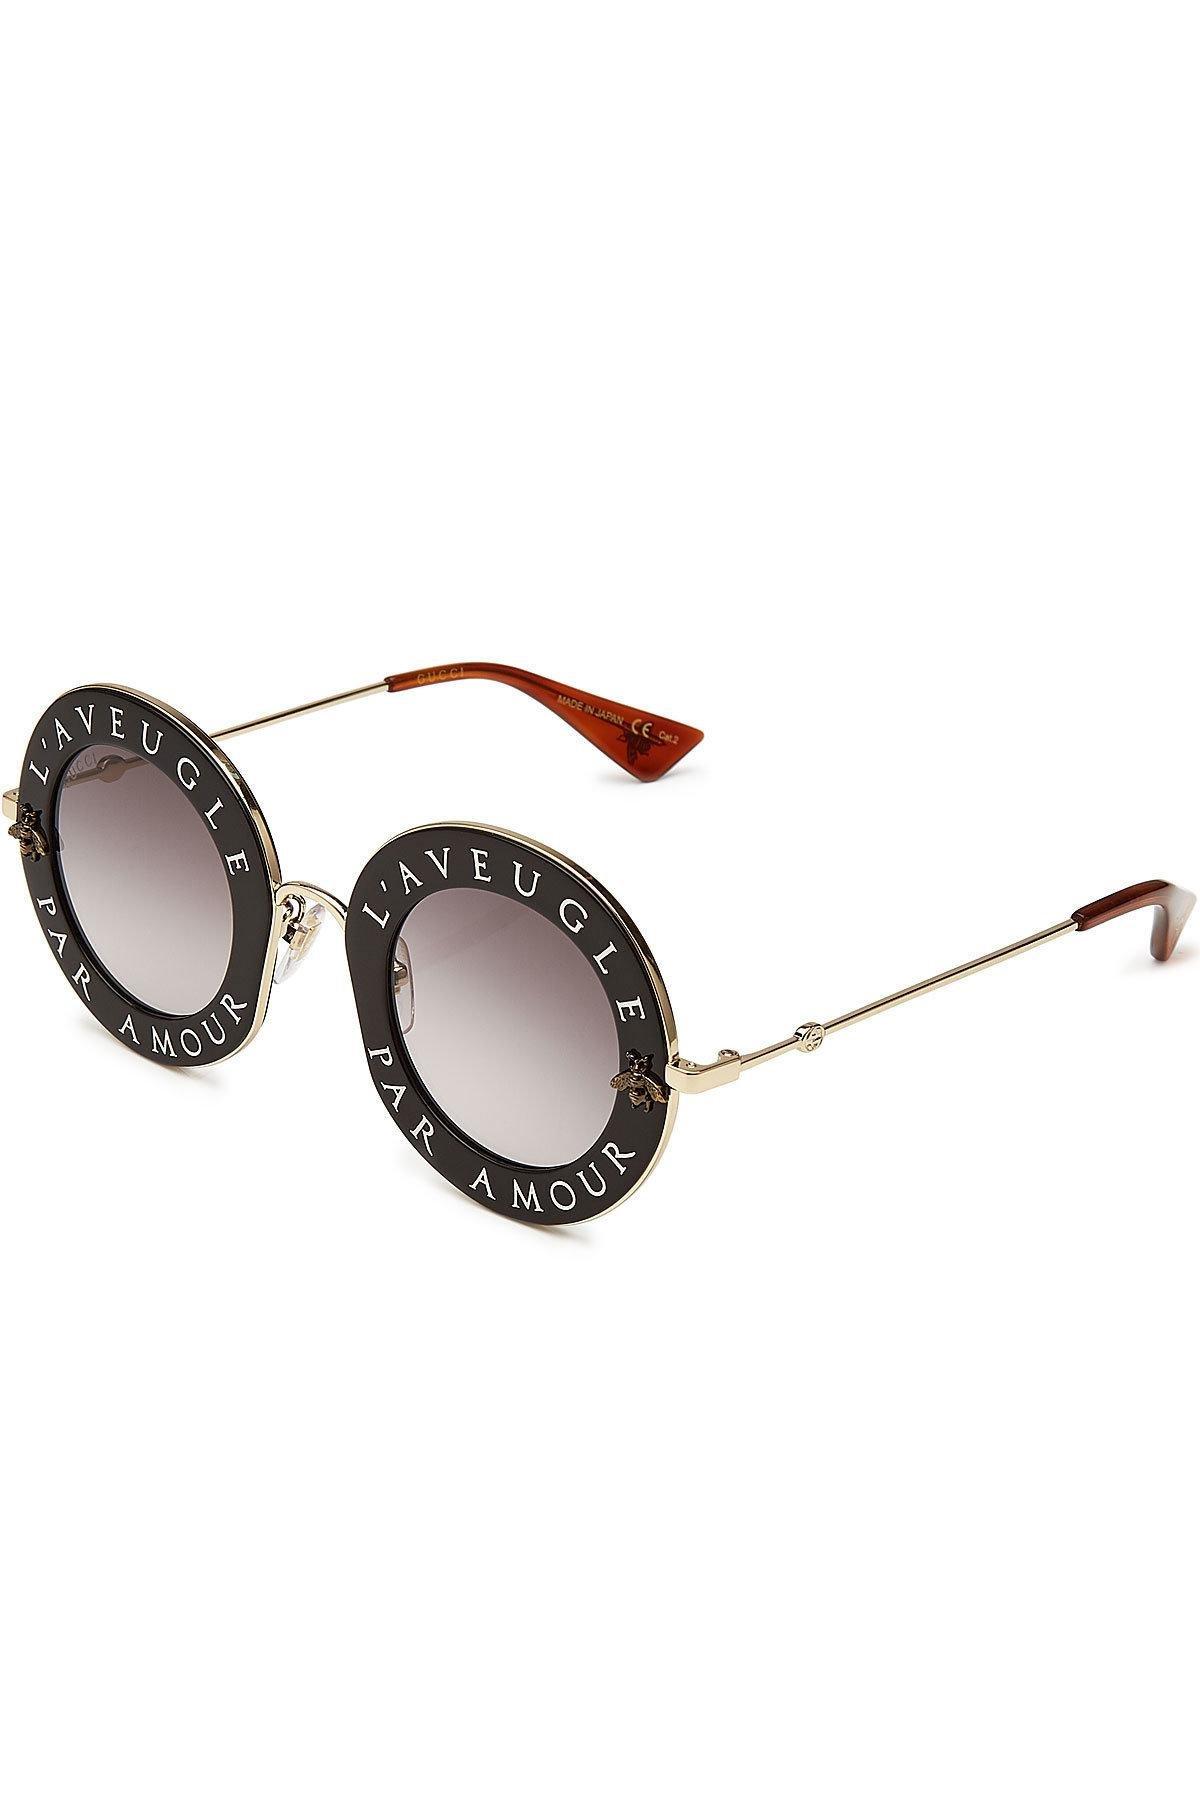 Wire Aviator Gles | Lyst Gucci L Aveugle Par Amour Round Sunglasses